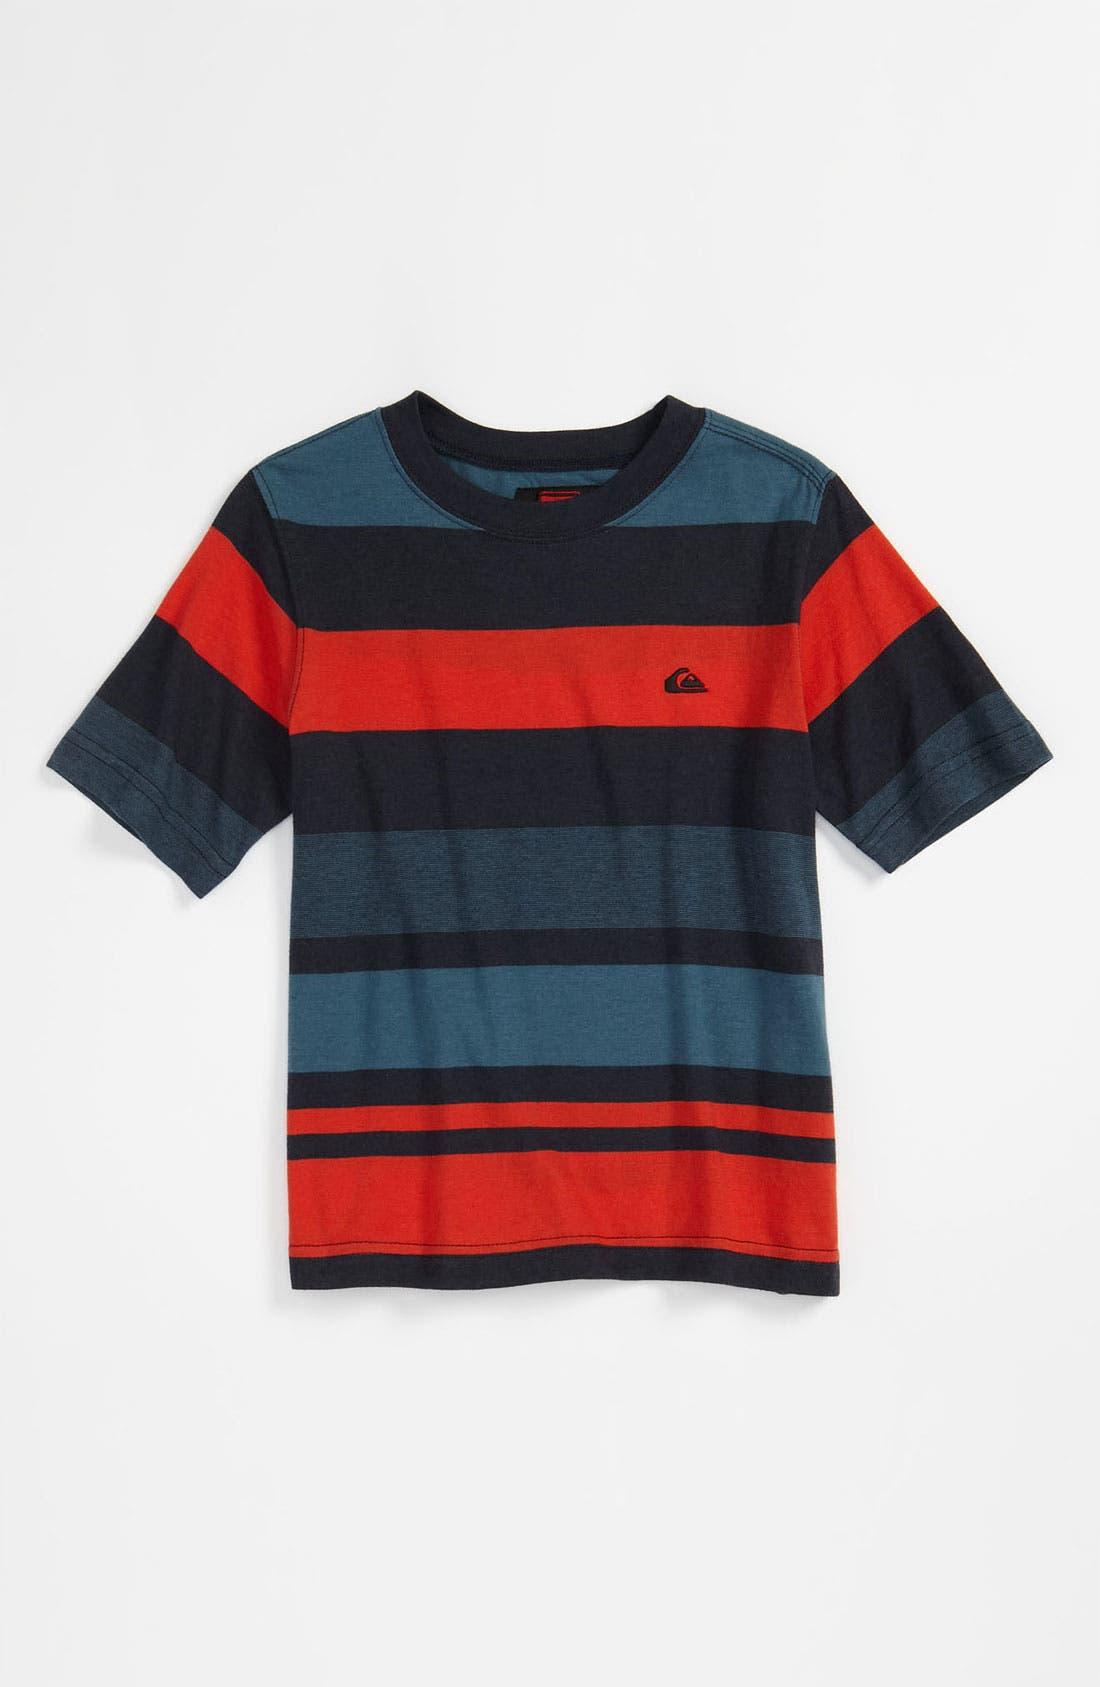 Main Image - Quiksilver 'Reasoner' T-Shirt (Little Boys)